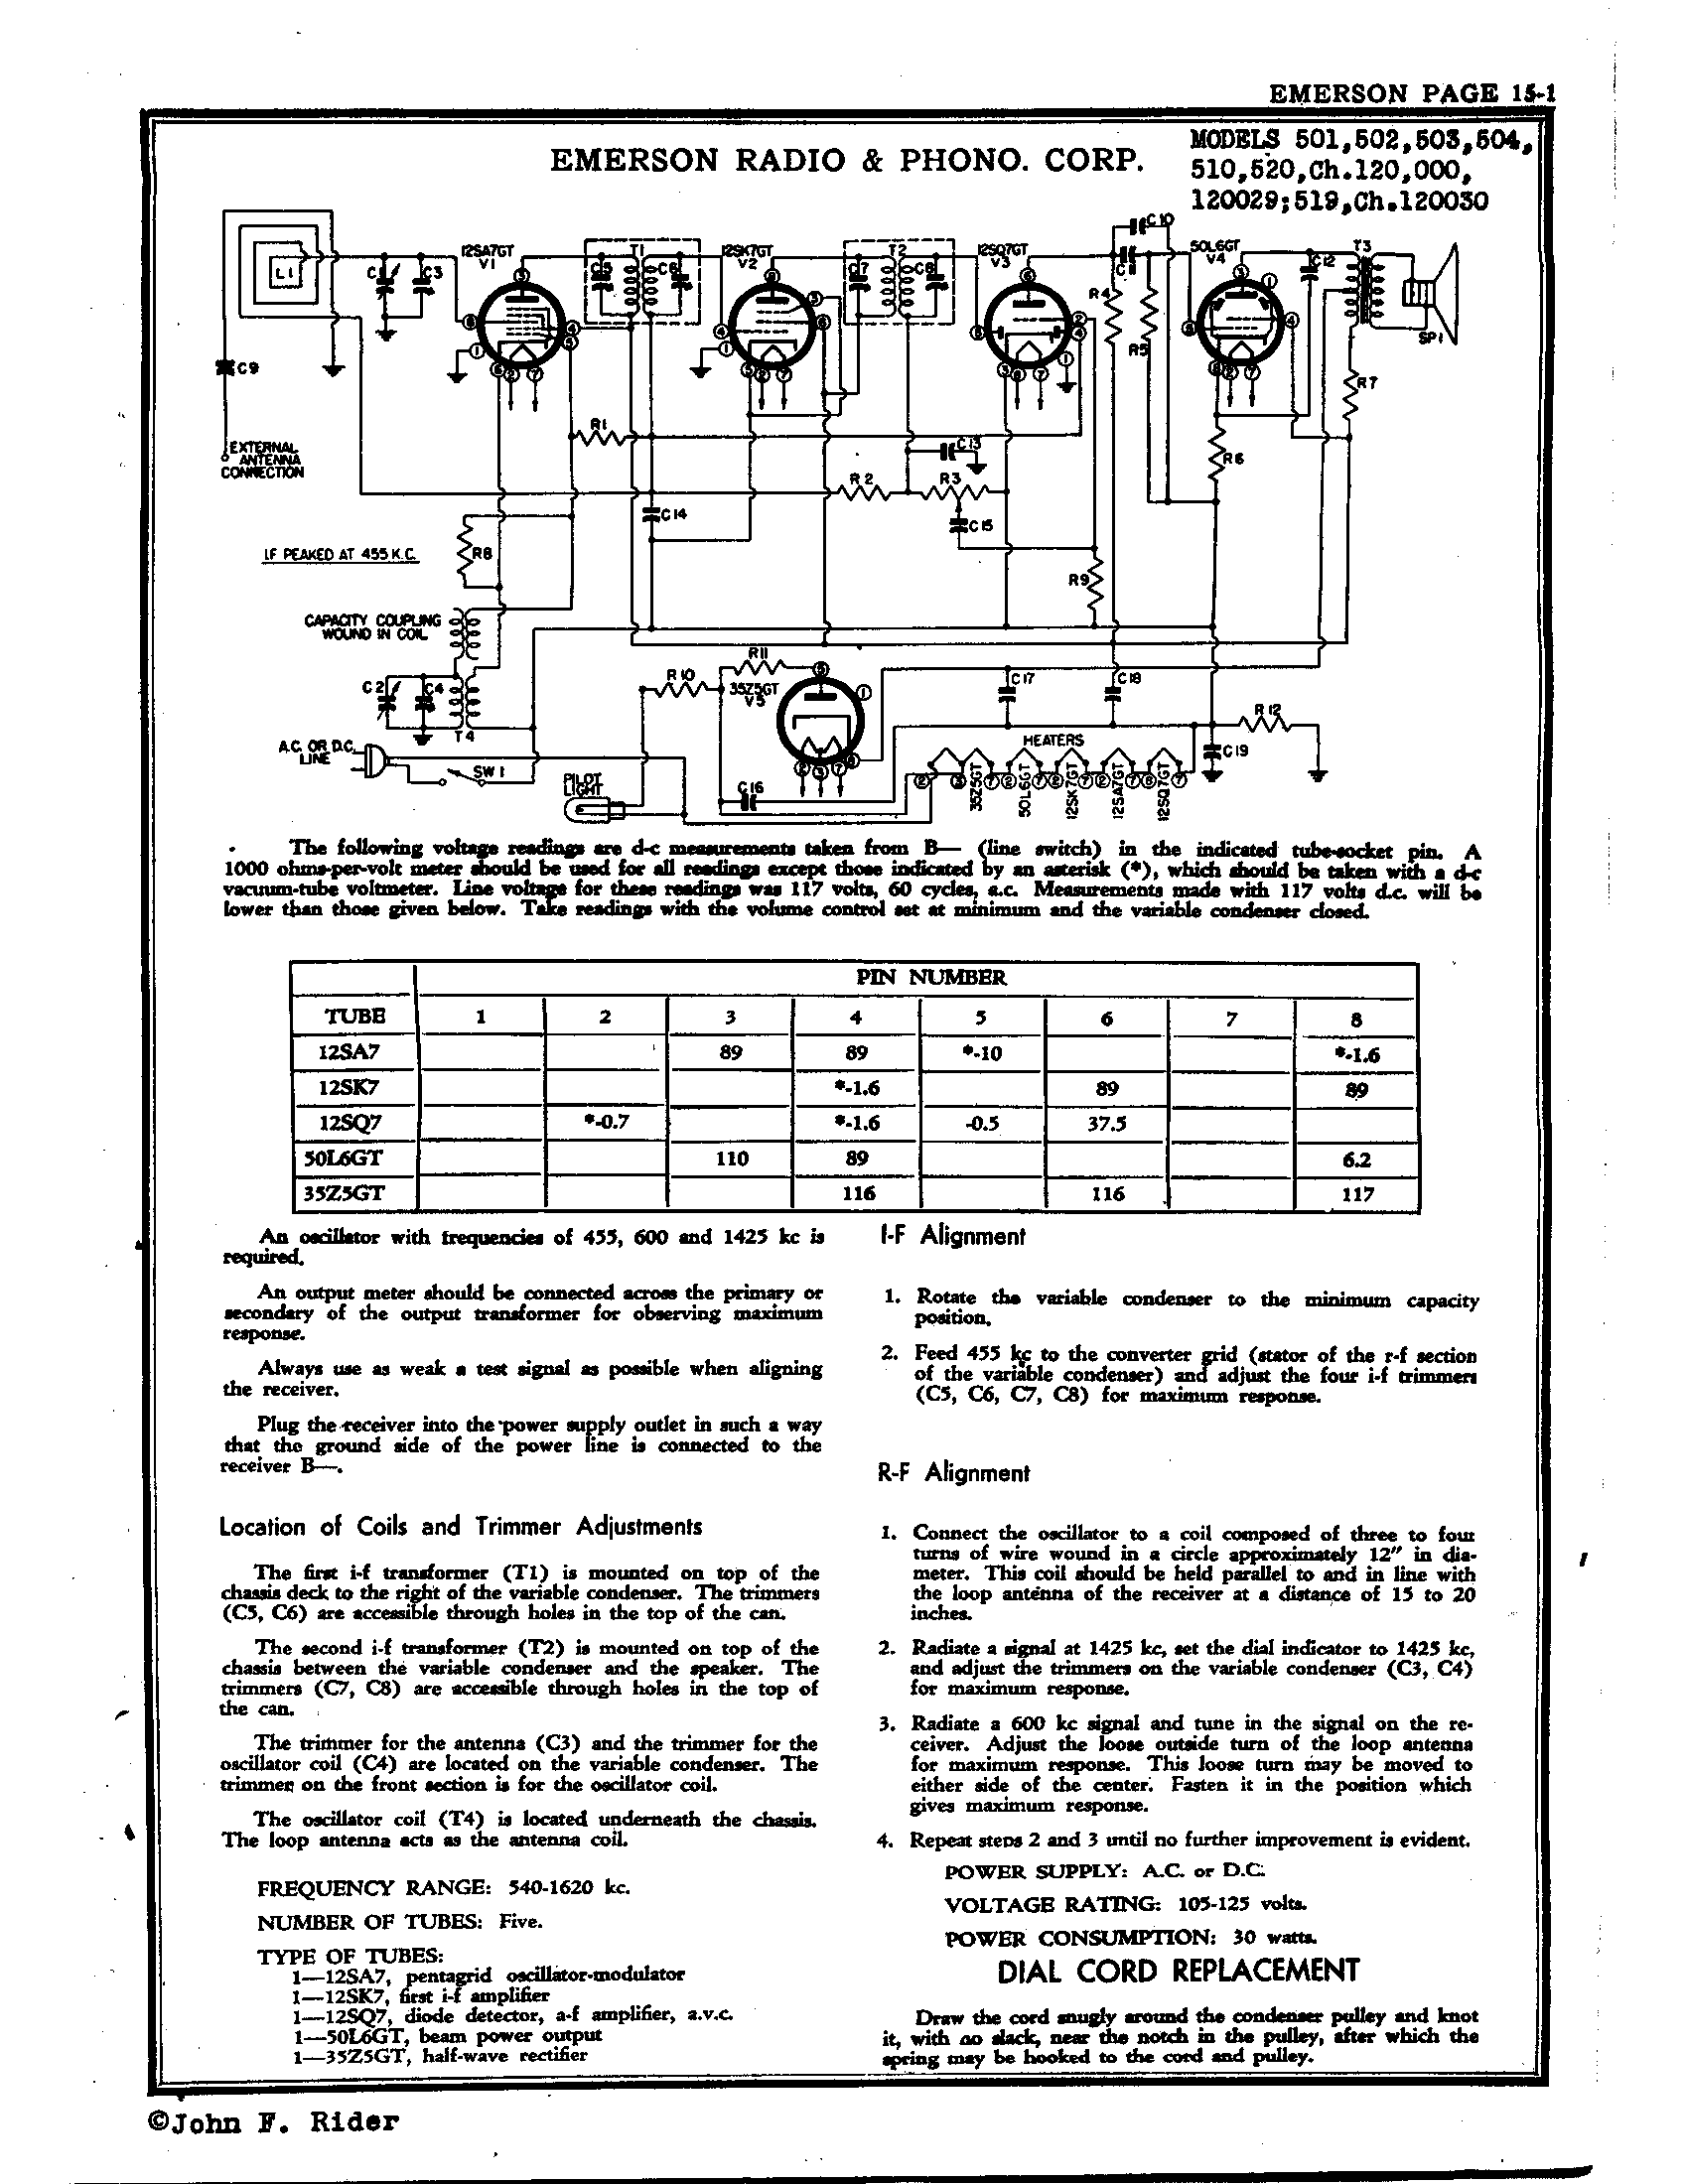 emerson radio phonograph corp 520 antique electronic supply rh tubesandmore com Antique Radio Schematics emerson schematics